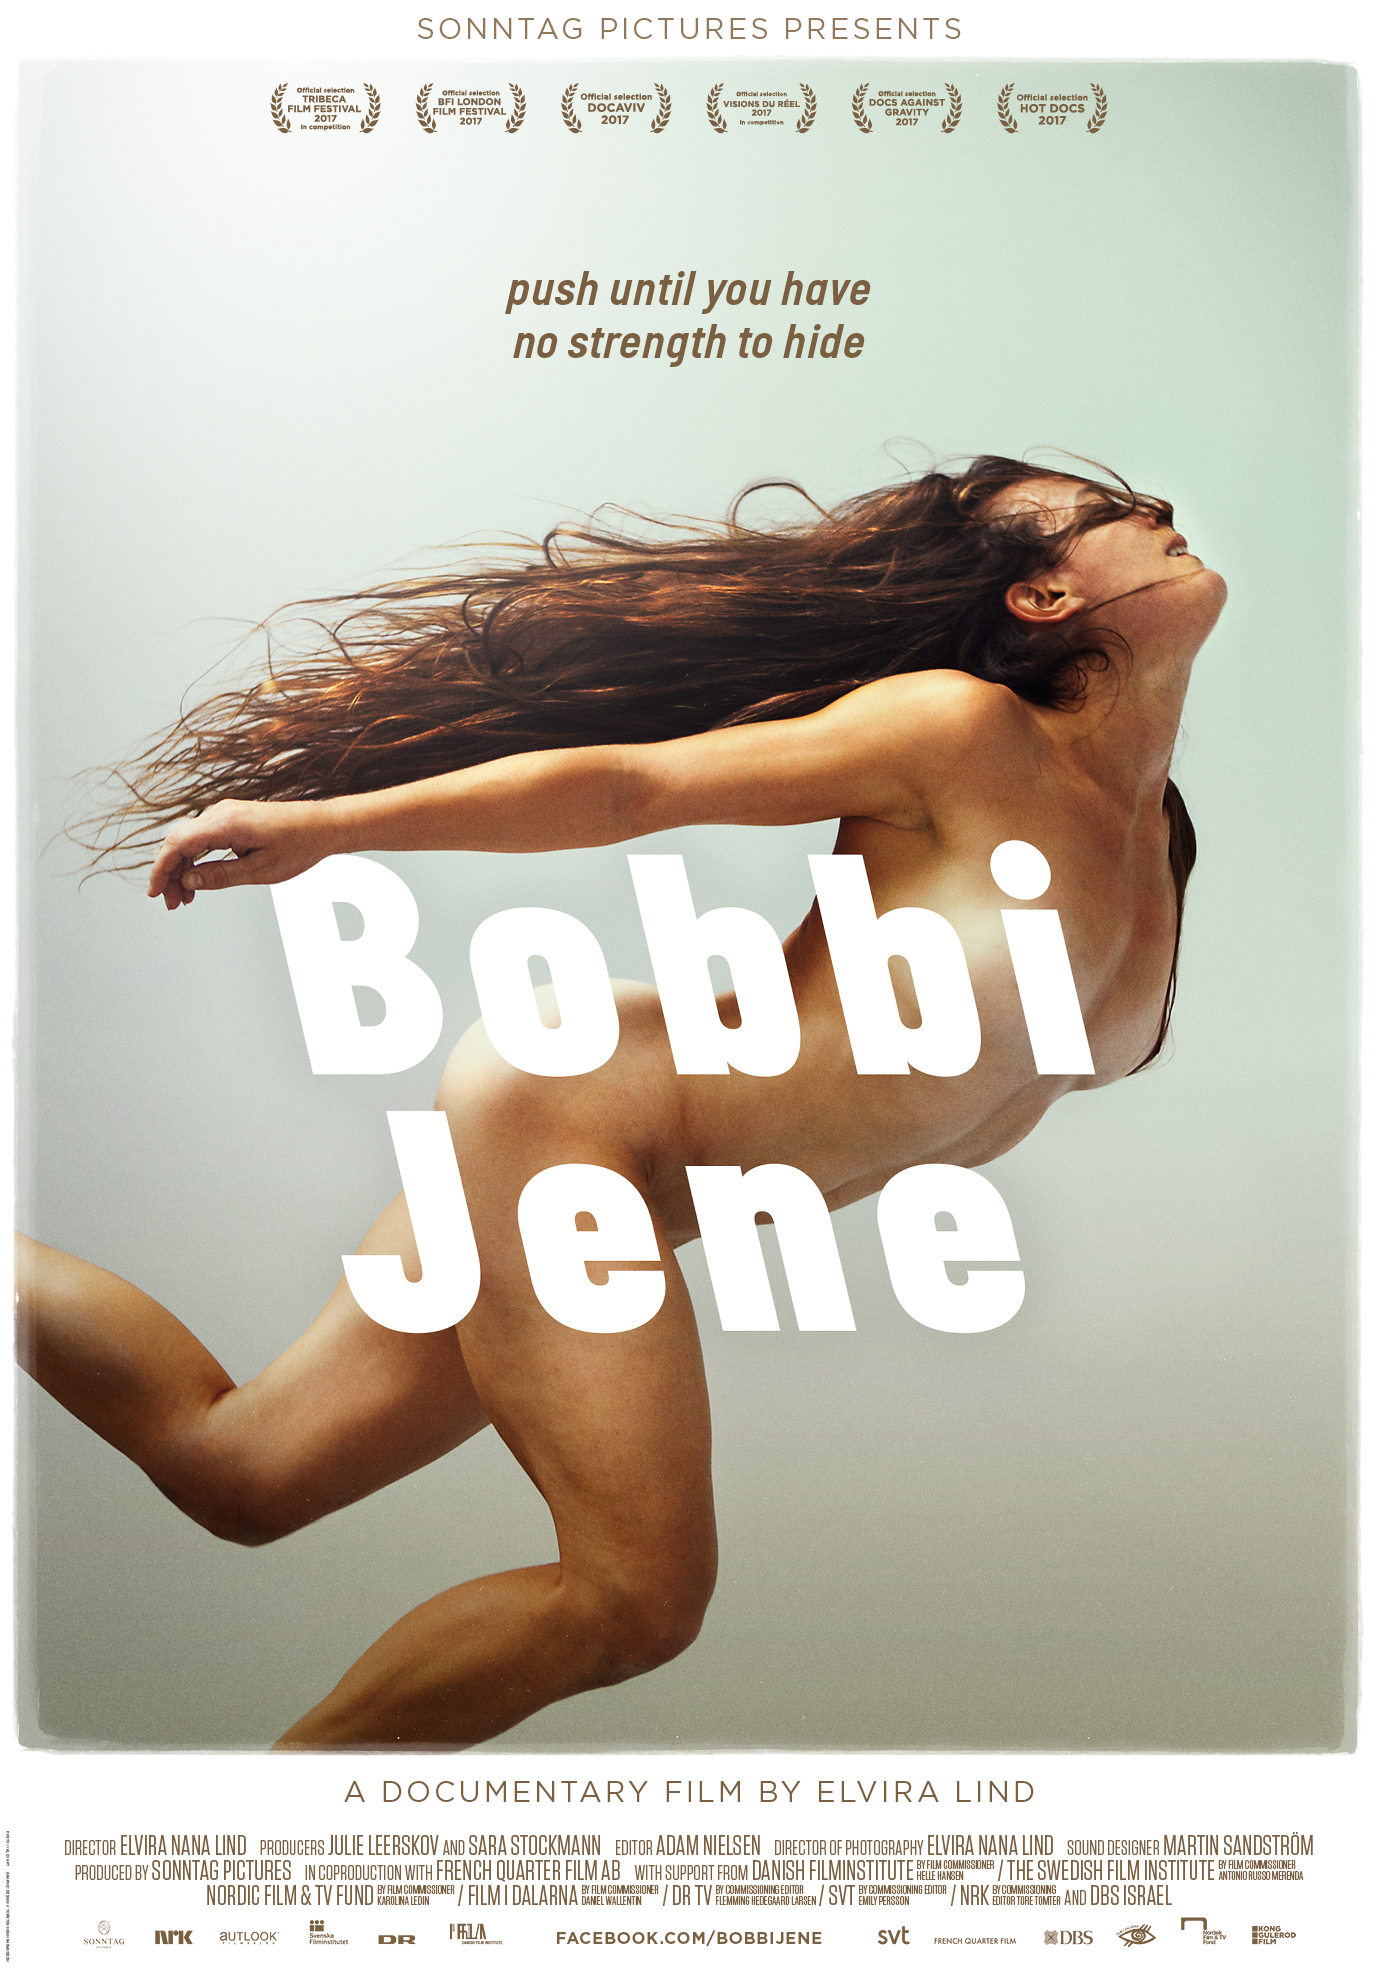 Bobbi Jene - feature documentary by Elvira Lind (2017)